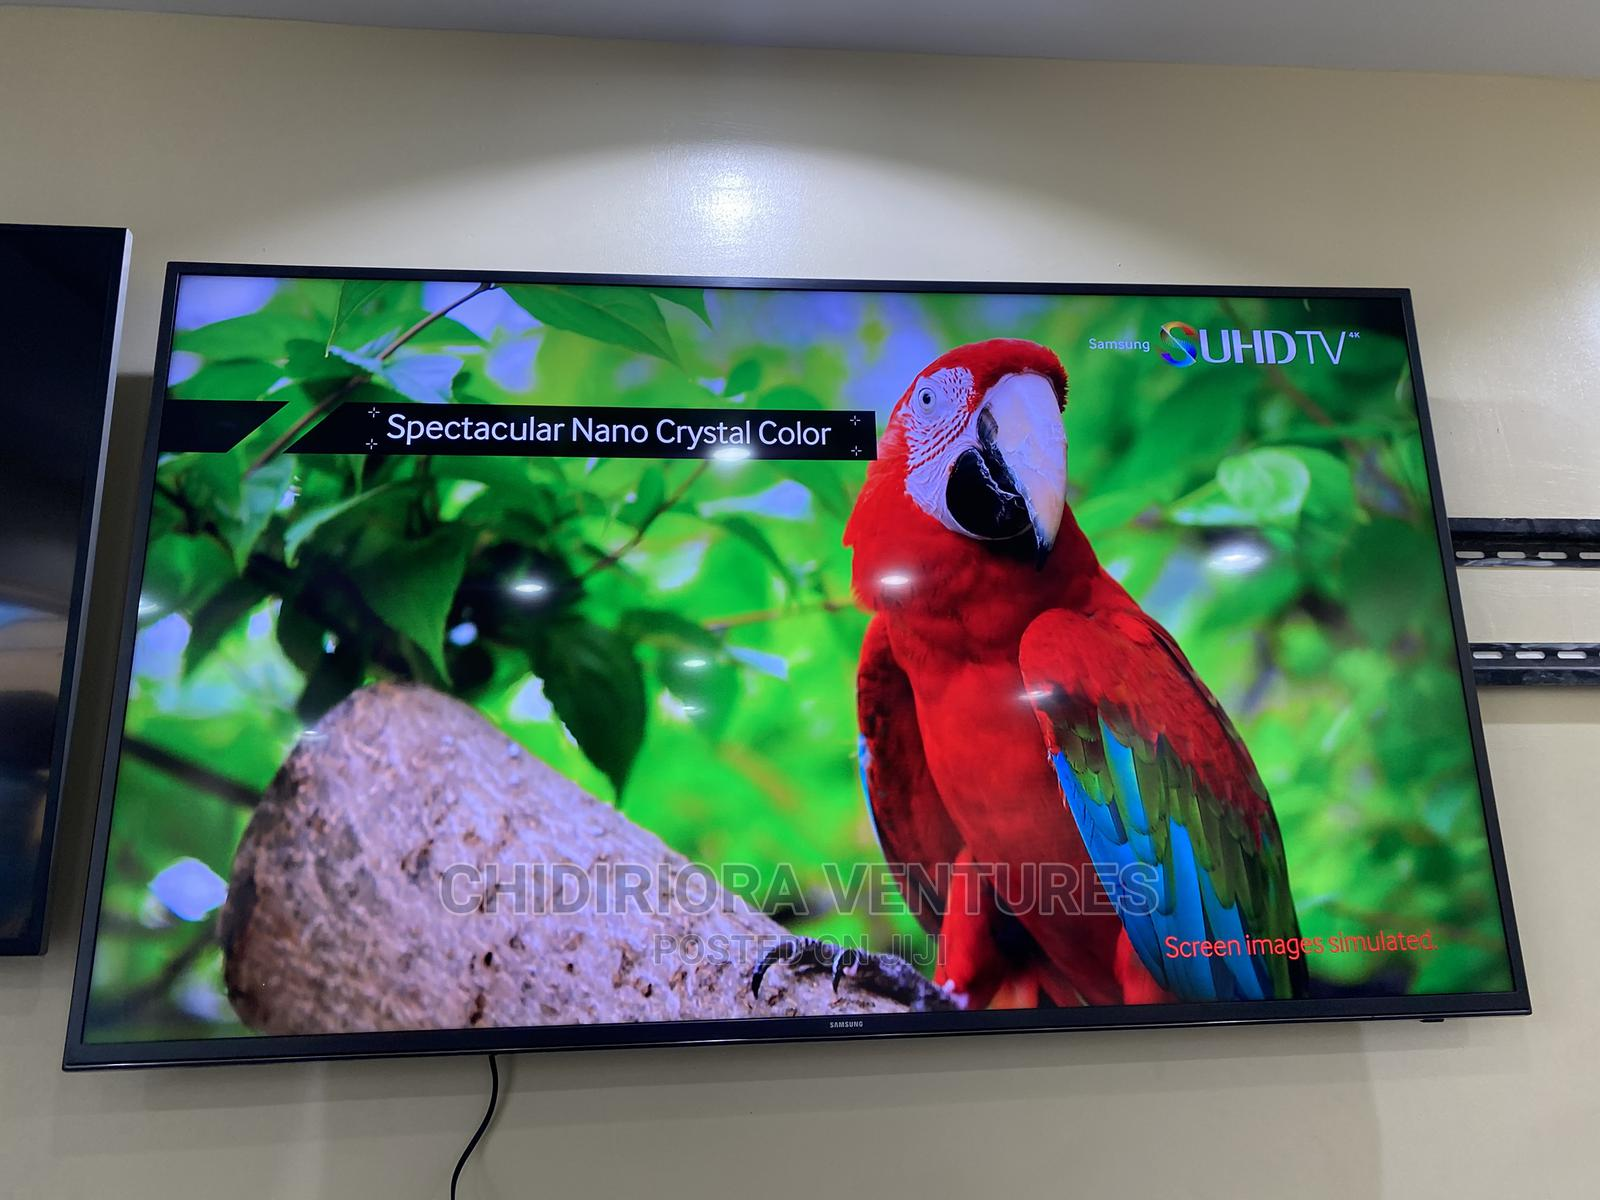 "Samsung Un60js7000 60"" Class 4K Ultra HD Smart LED Suhd TV | TV & DVD Equipment for sale in Ojo, Lagos State, Nigeria"